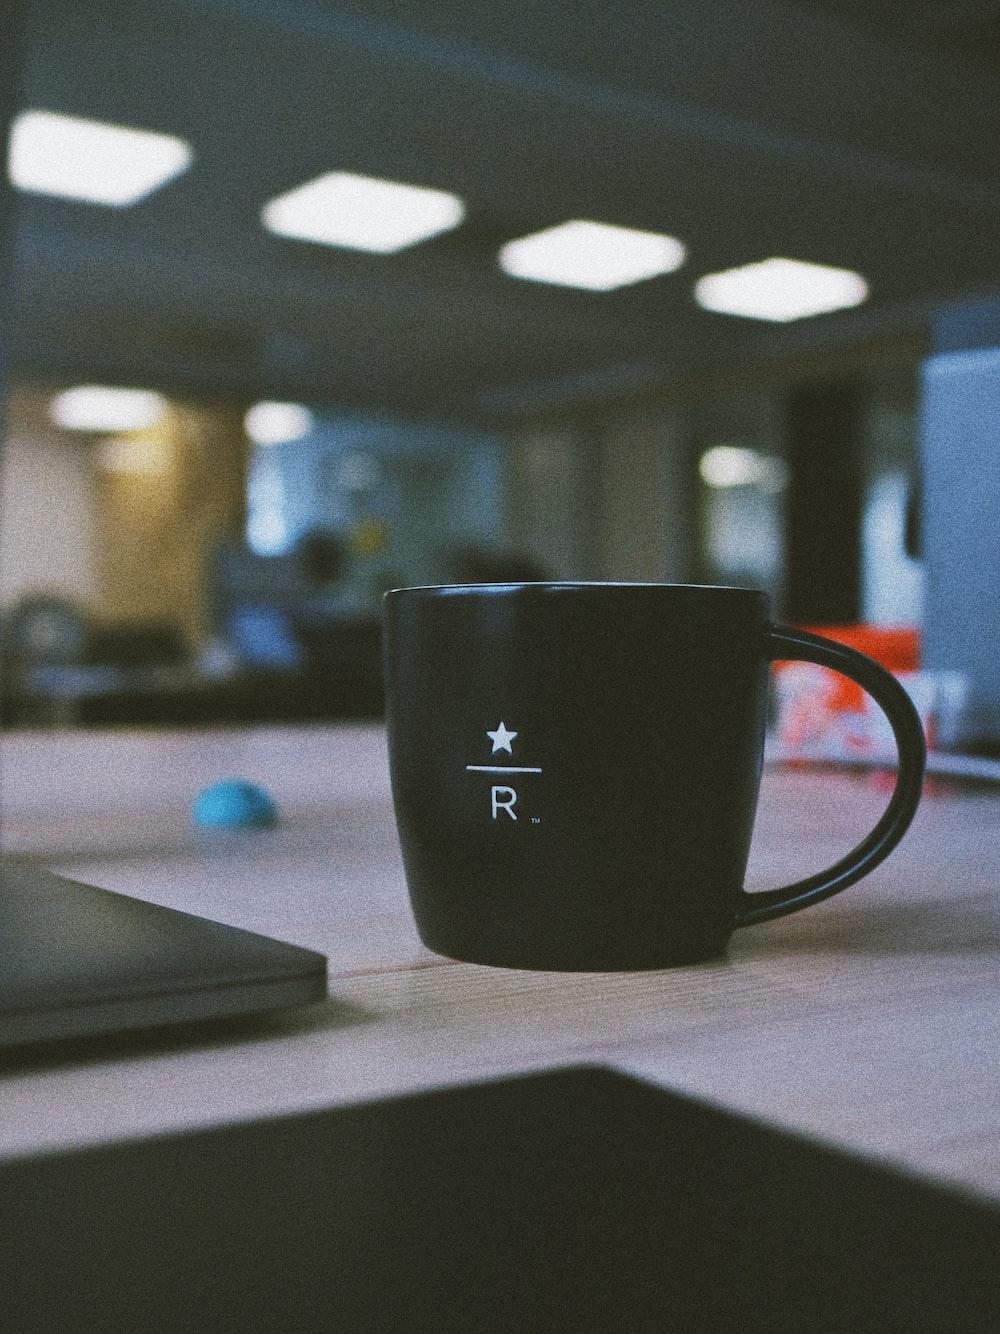 black ceramic mug on wooden table